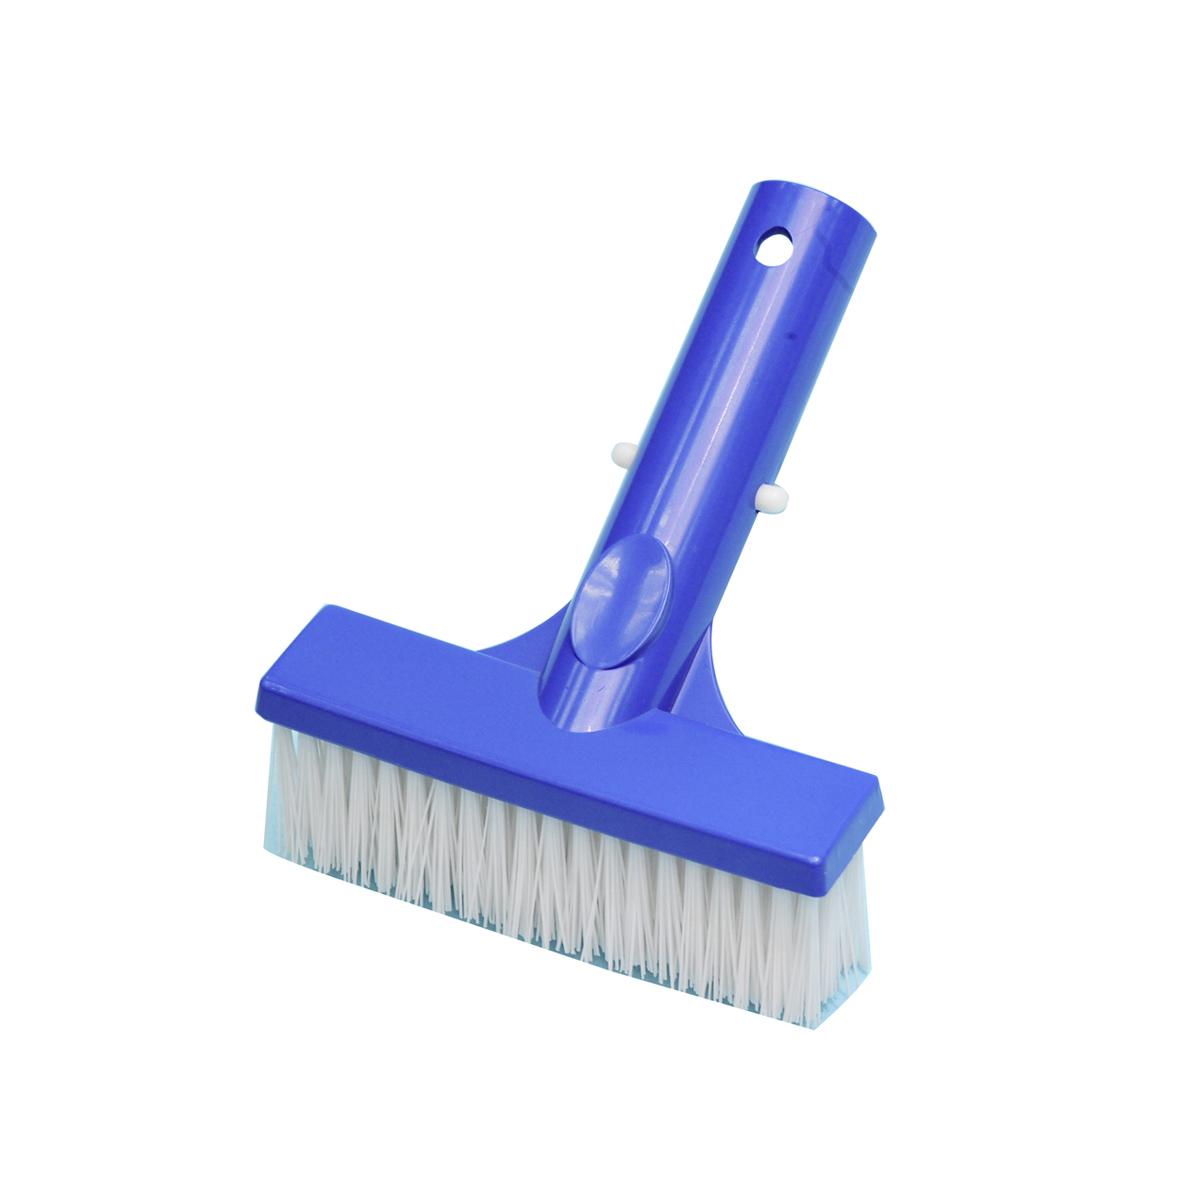 "Smart Poolbürste kurz PP blau einzeln verpackt, 13 cm/5"" unzerbrechlich Smart Poolbürste kurz PP blau einzeln verpackt, 13 cm/5"" unzerbrechlich"